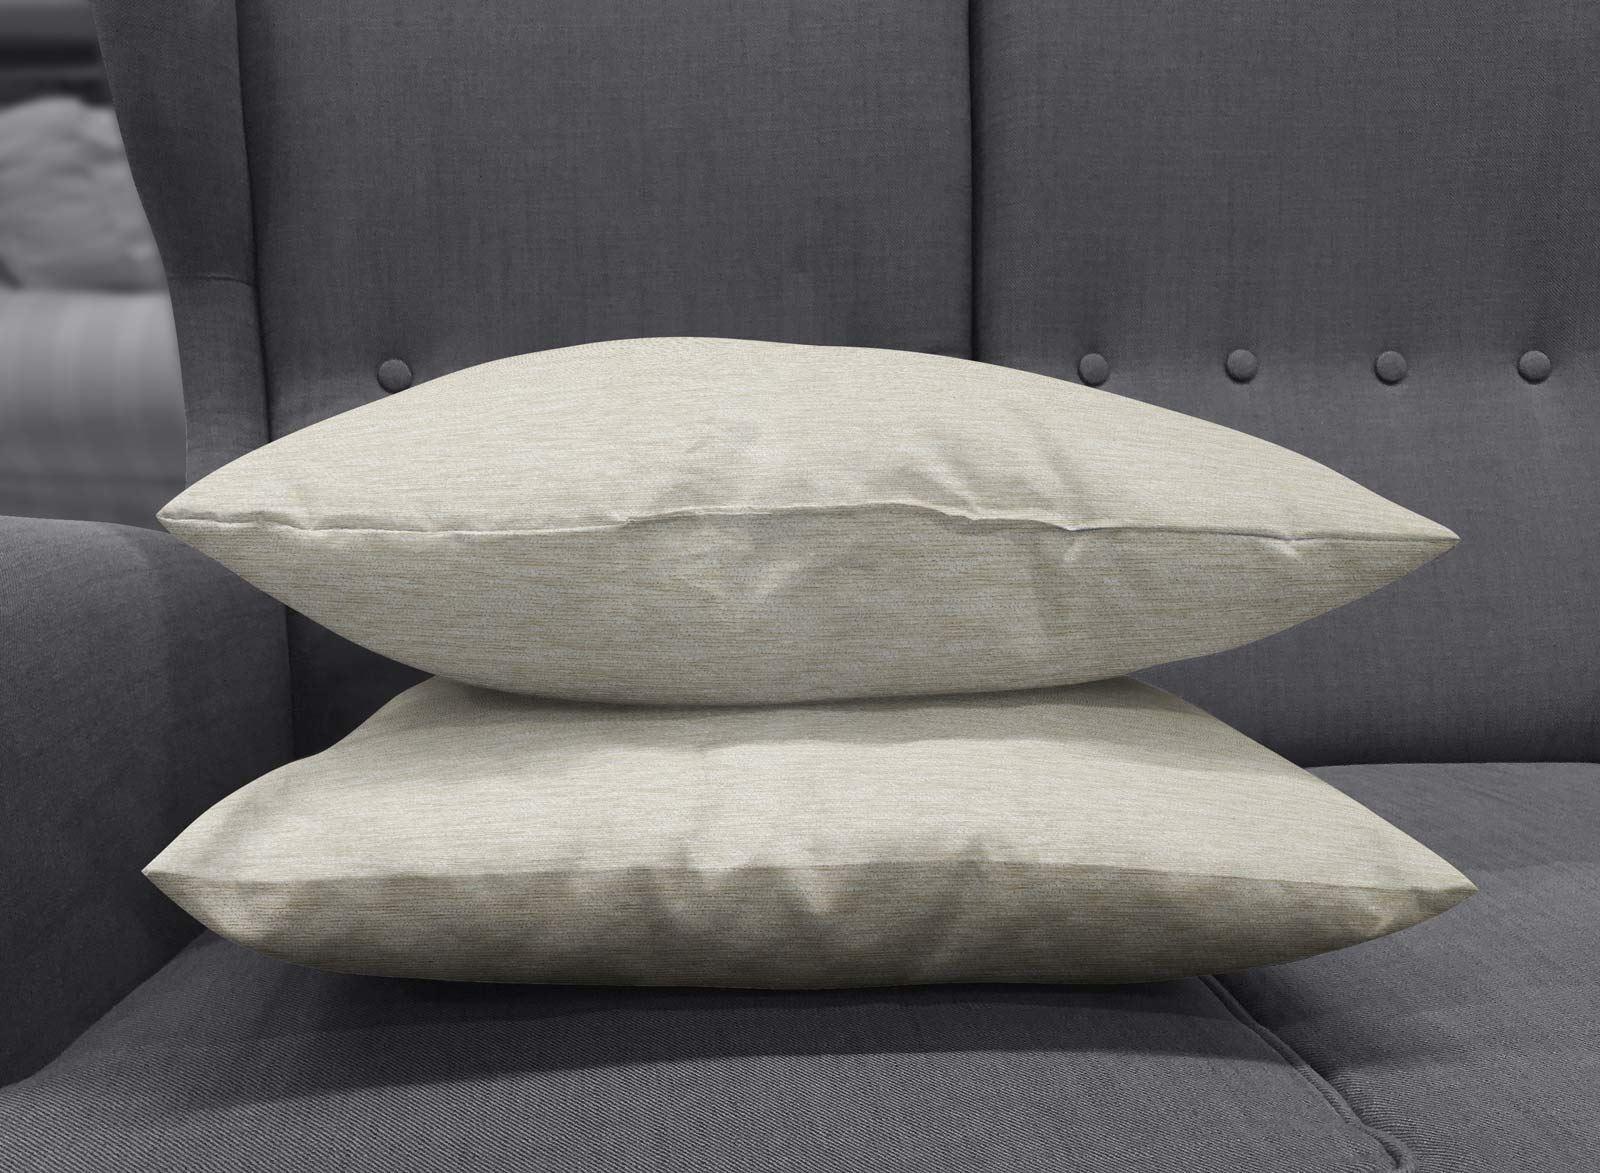 Set-of-2-Chenille-Cushion-Covers-Luxury-Plain-Cushions-Cover-Pairs-18-034-x-18-034 thumbnail 36